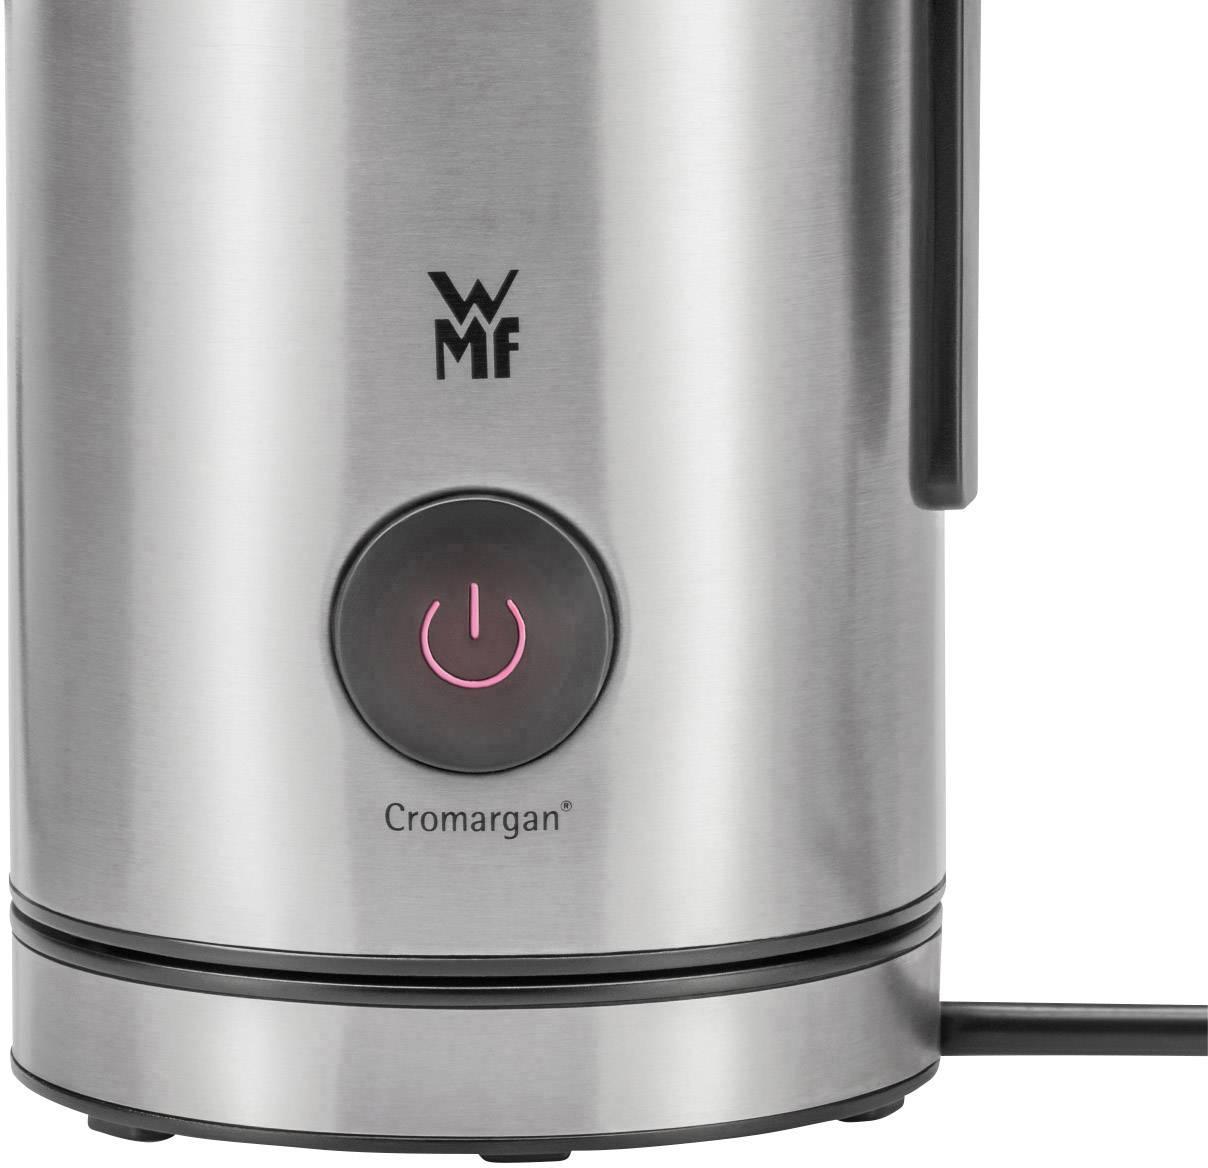 WMF Stelio 0413220011 naprava za penjenje mleka cromargan 500 W